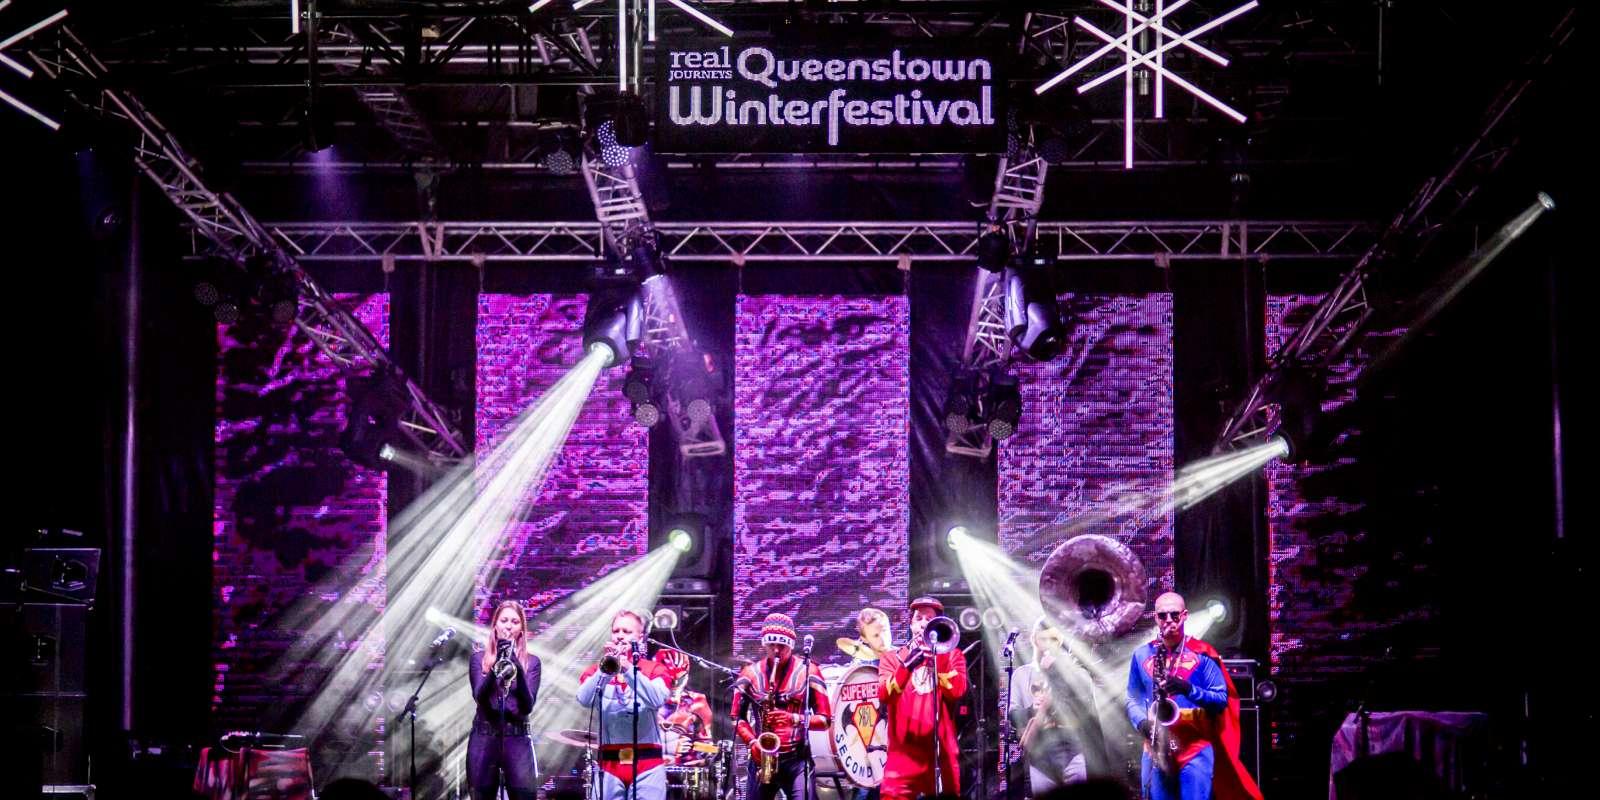 Queenstown Winter Festival live entertainment